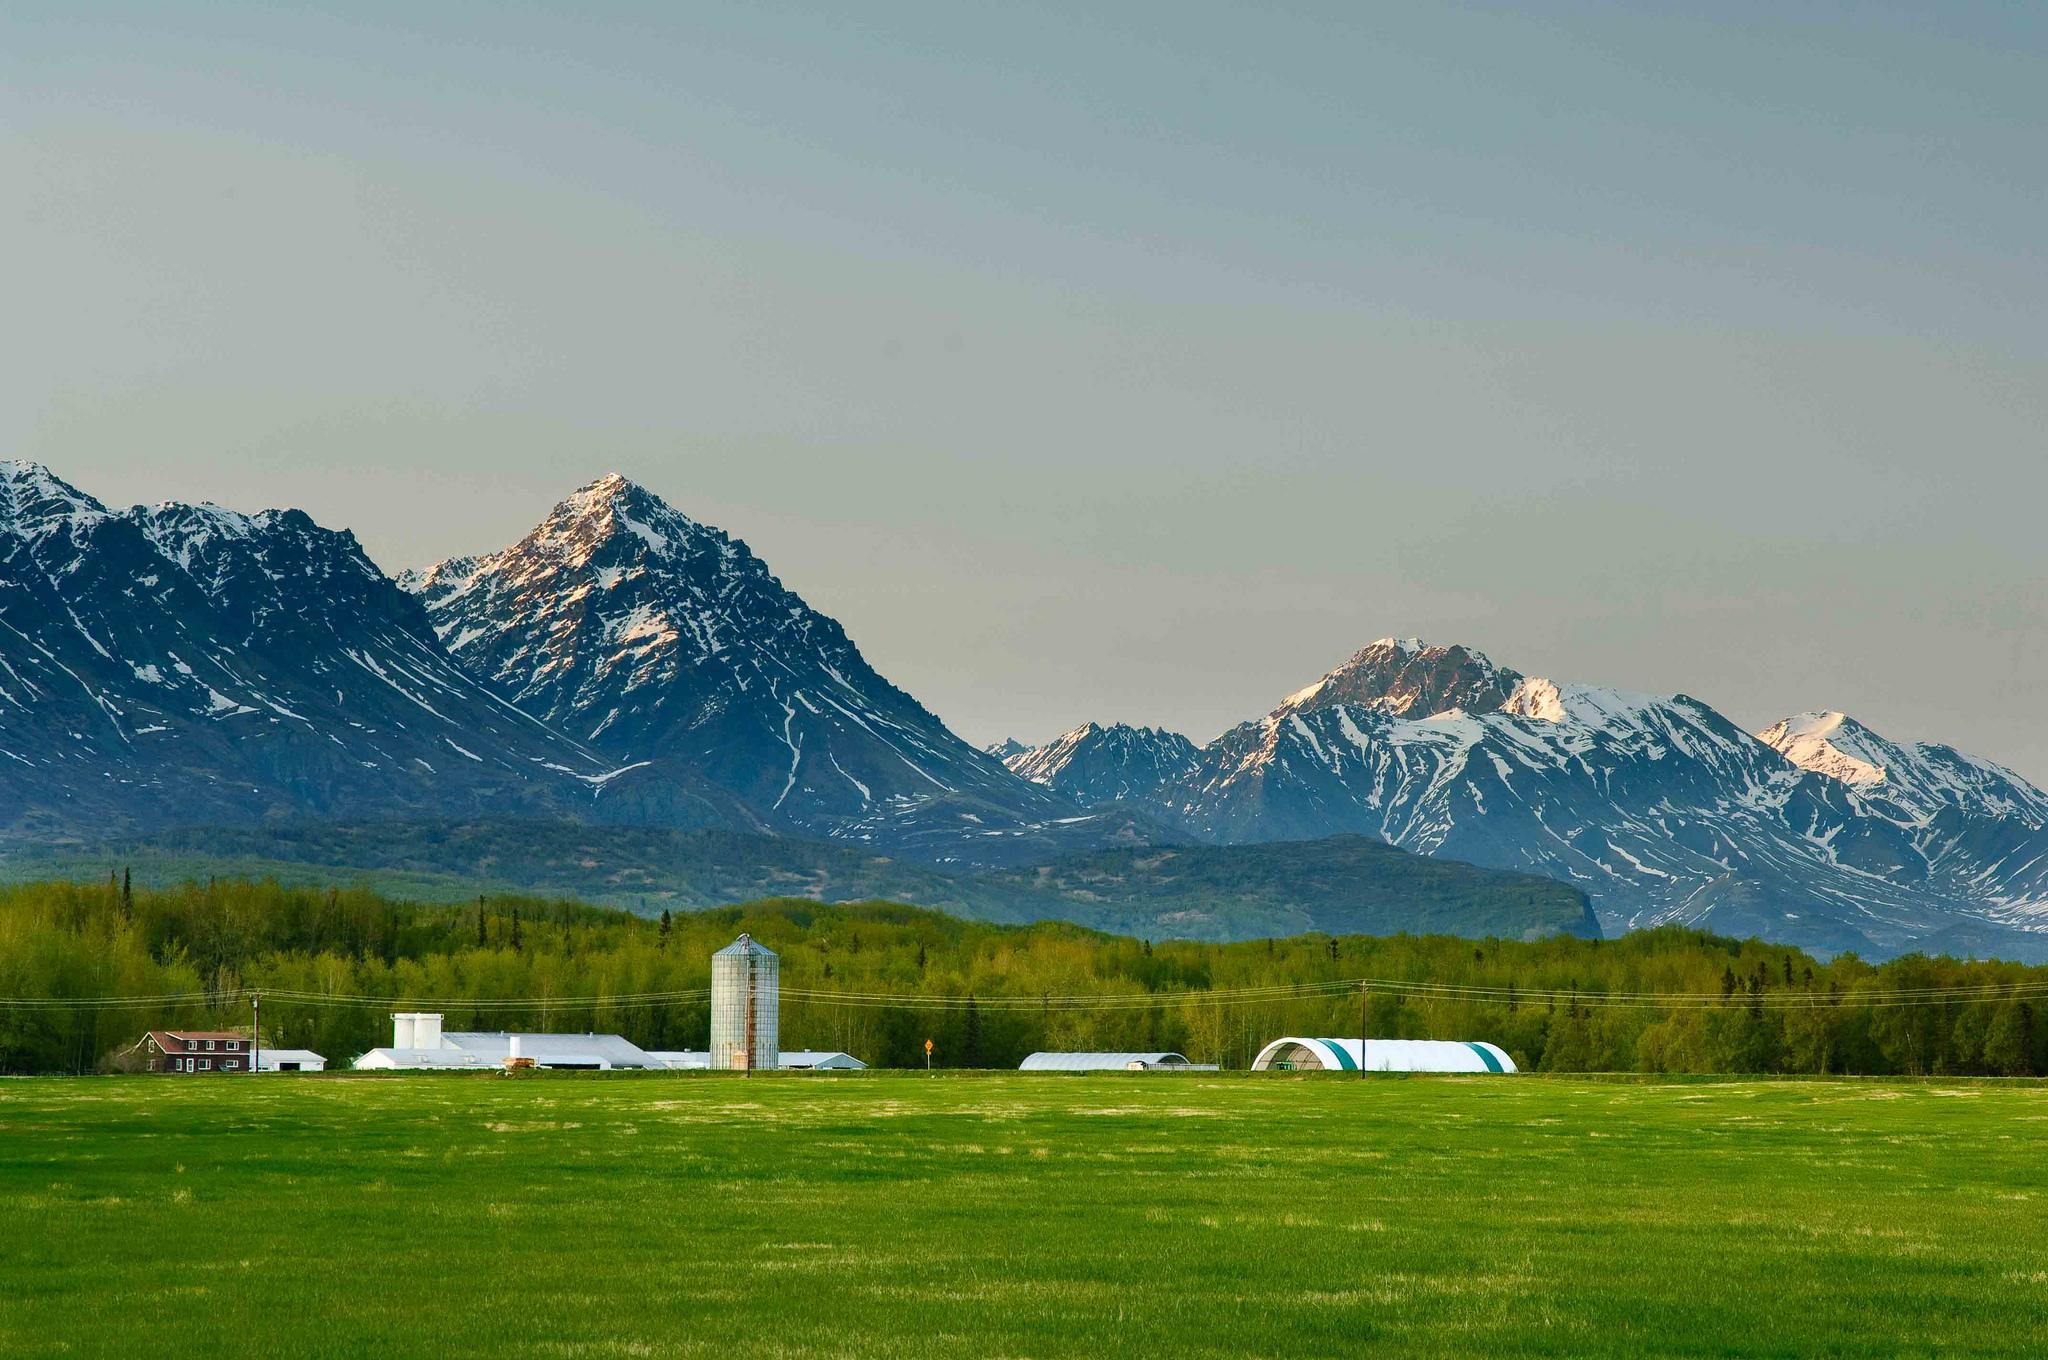 Alaskans Living With Coal Mining Detritus